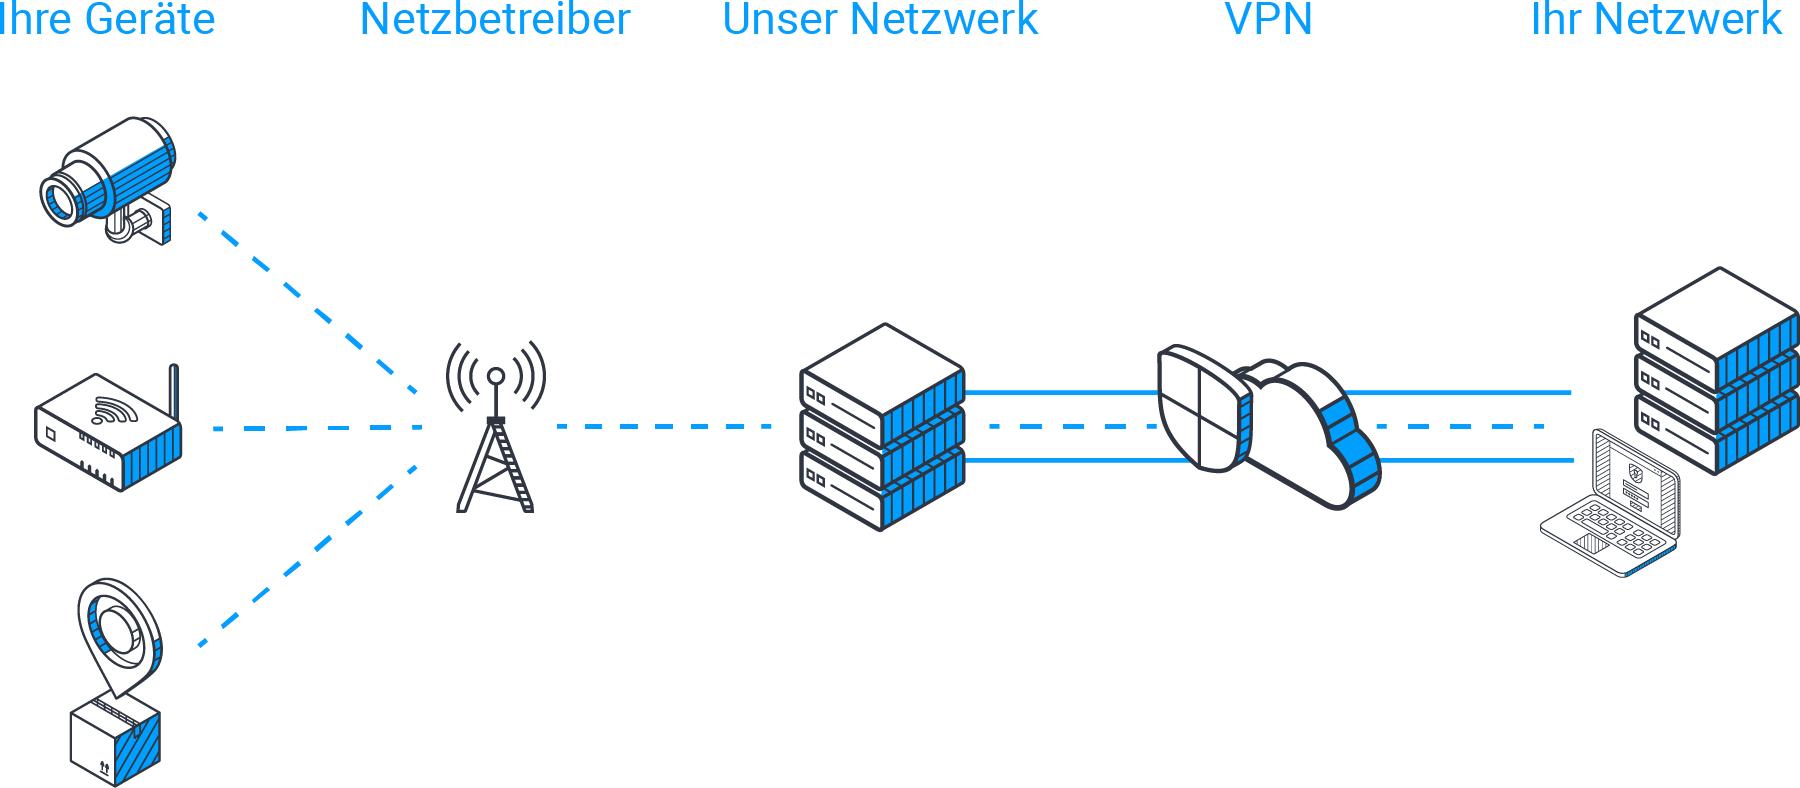 VPN, APN and static IP addresses